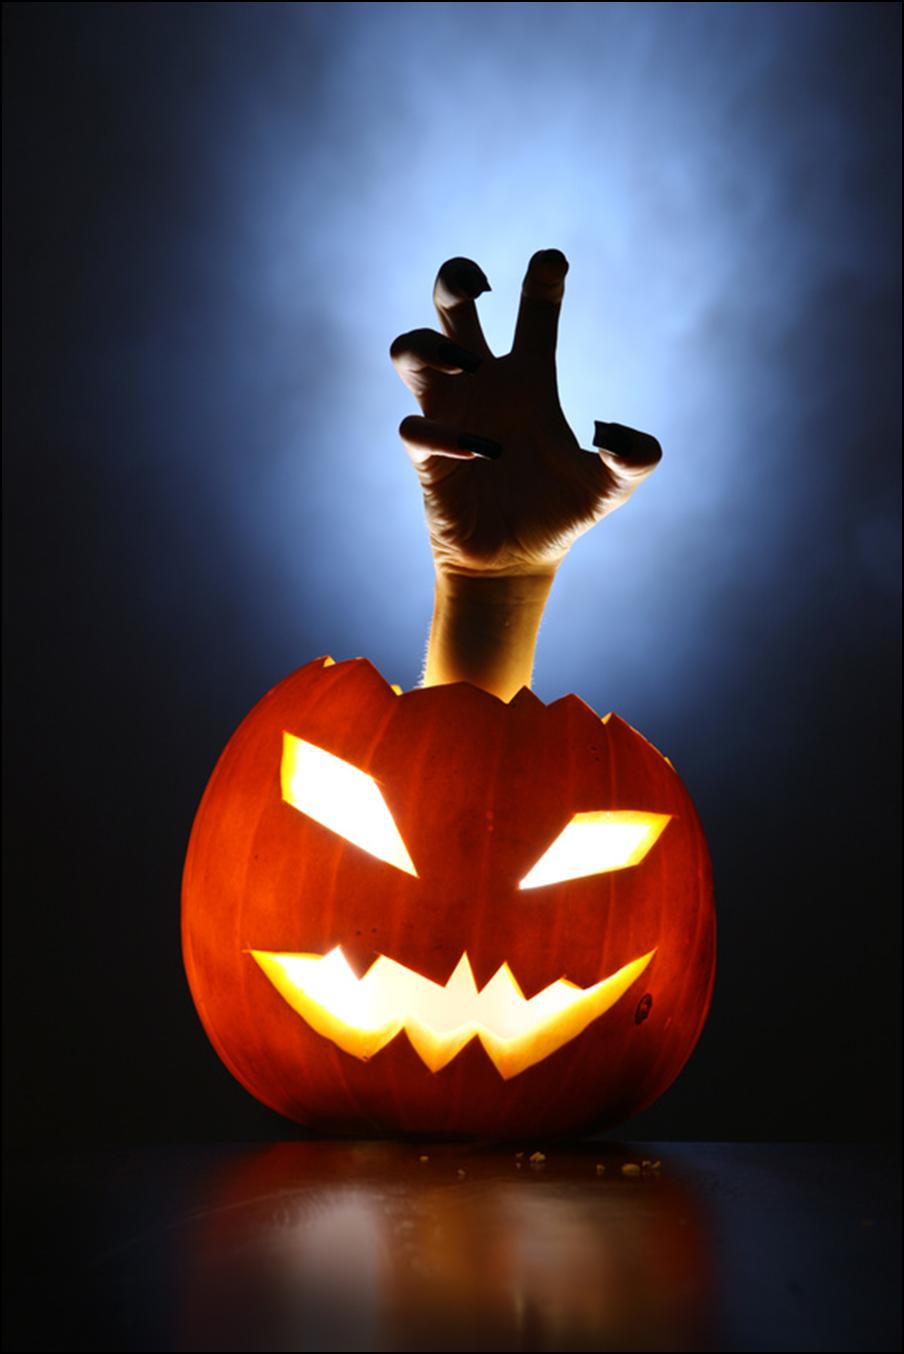 scary_pumpkin